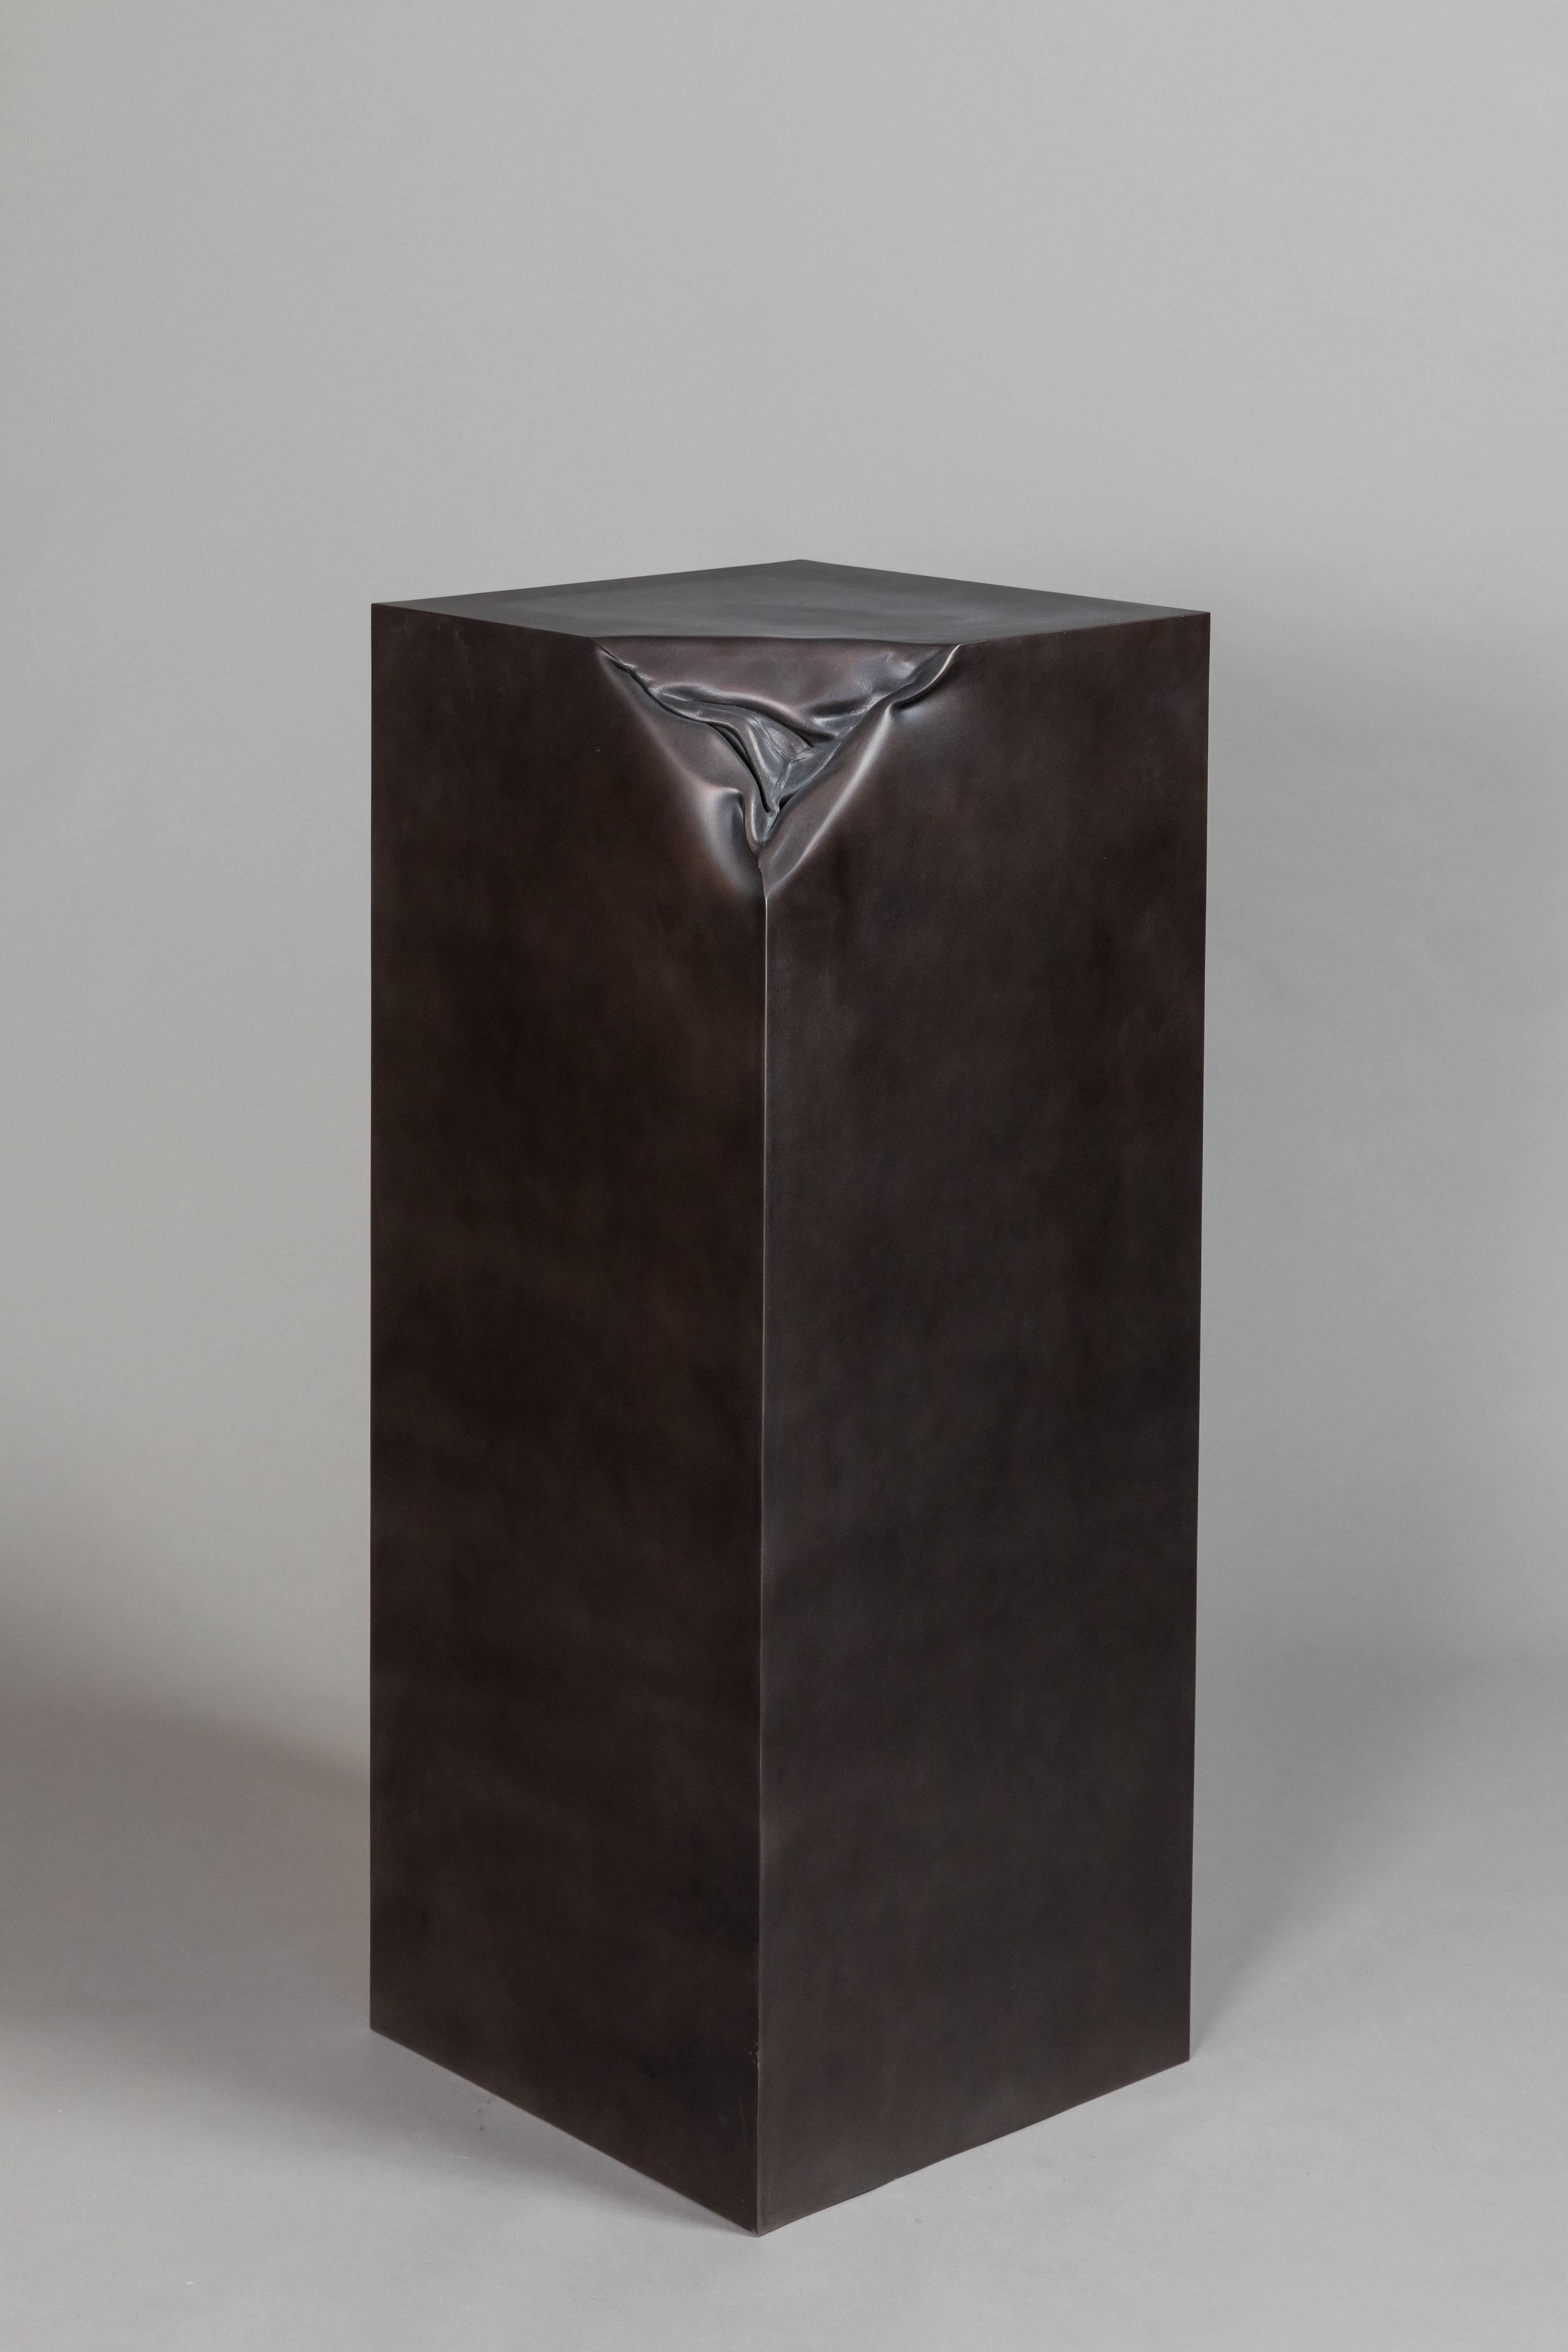 Near Perfect, 2012, steel, 40 x 18 x 18 in, $6,500